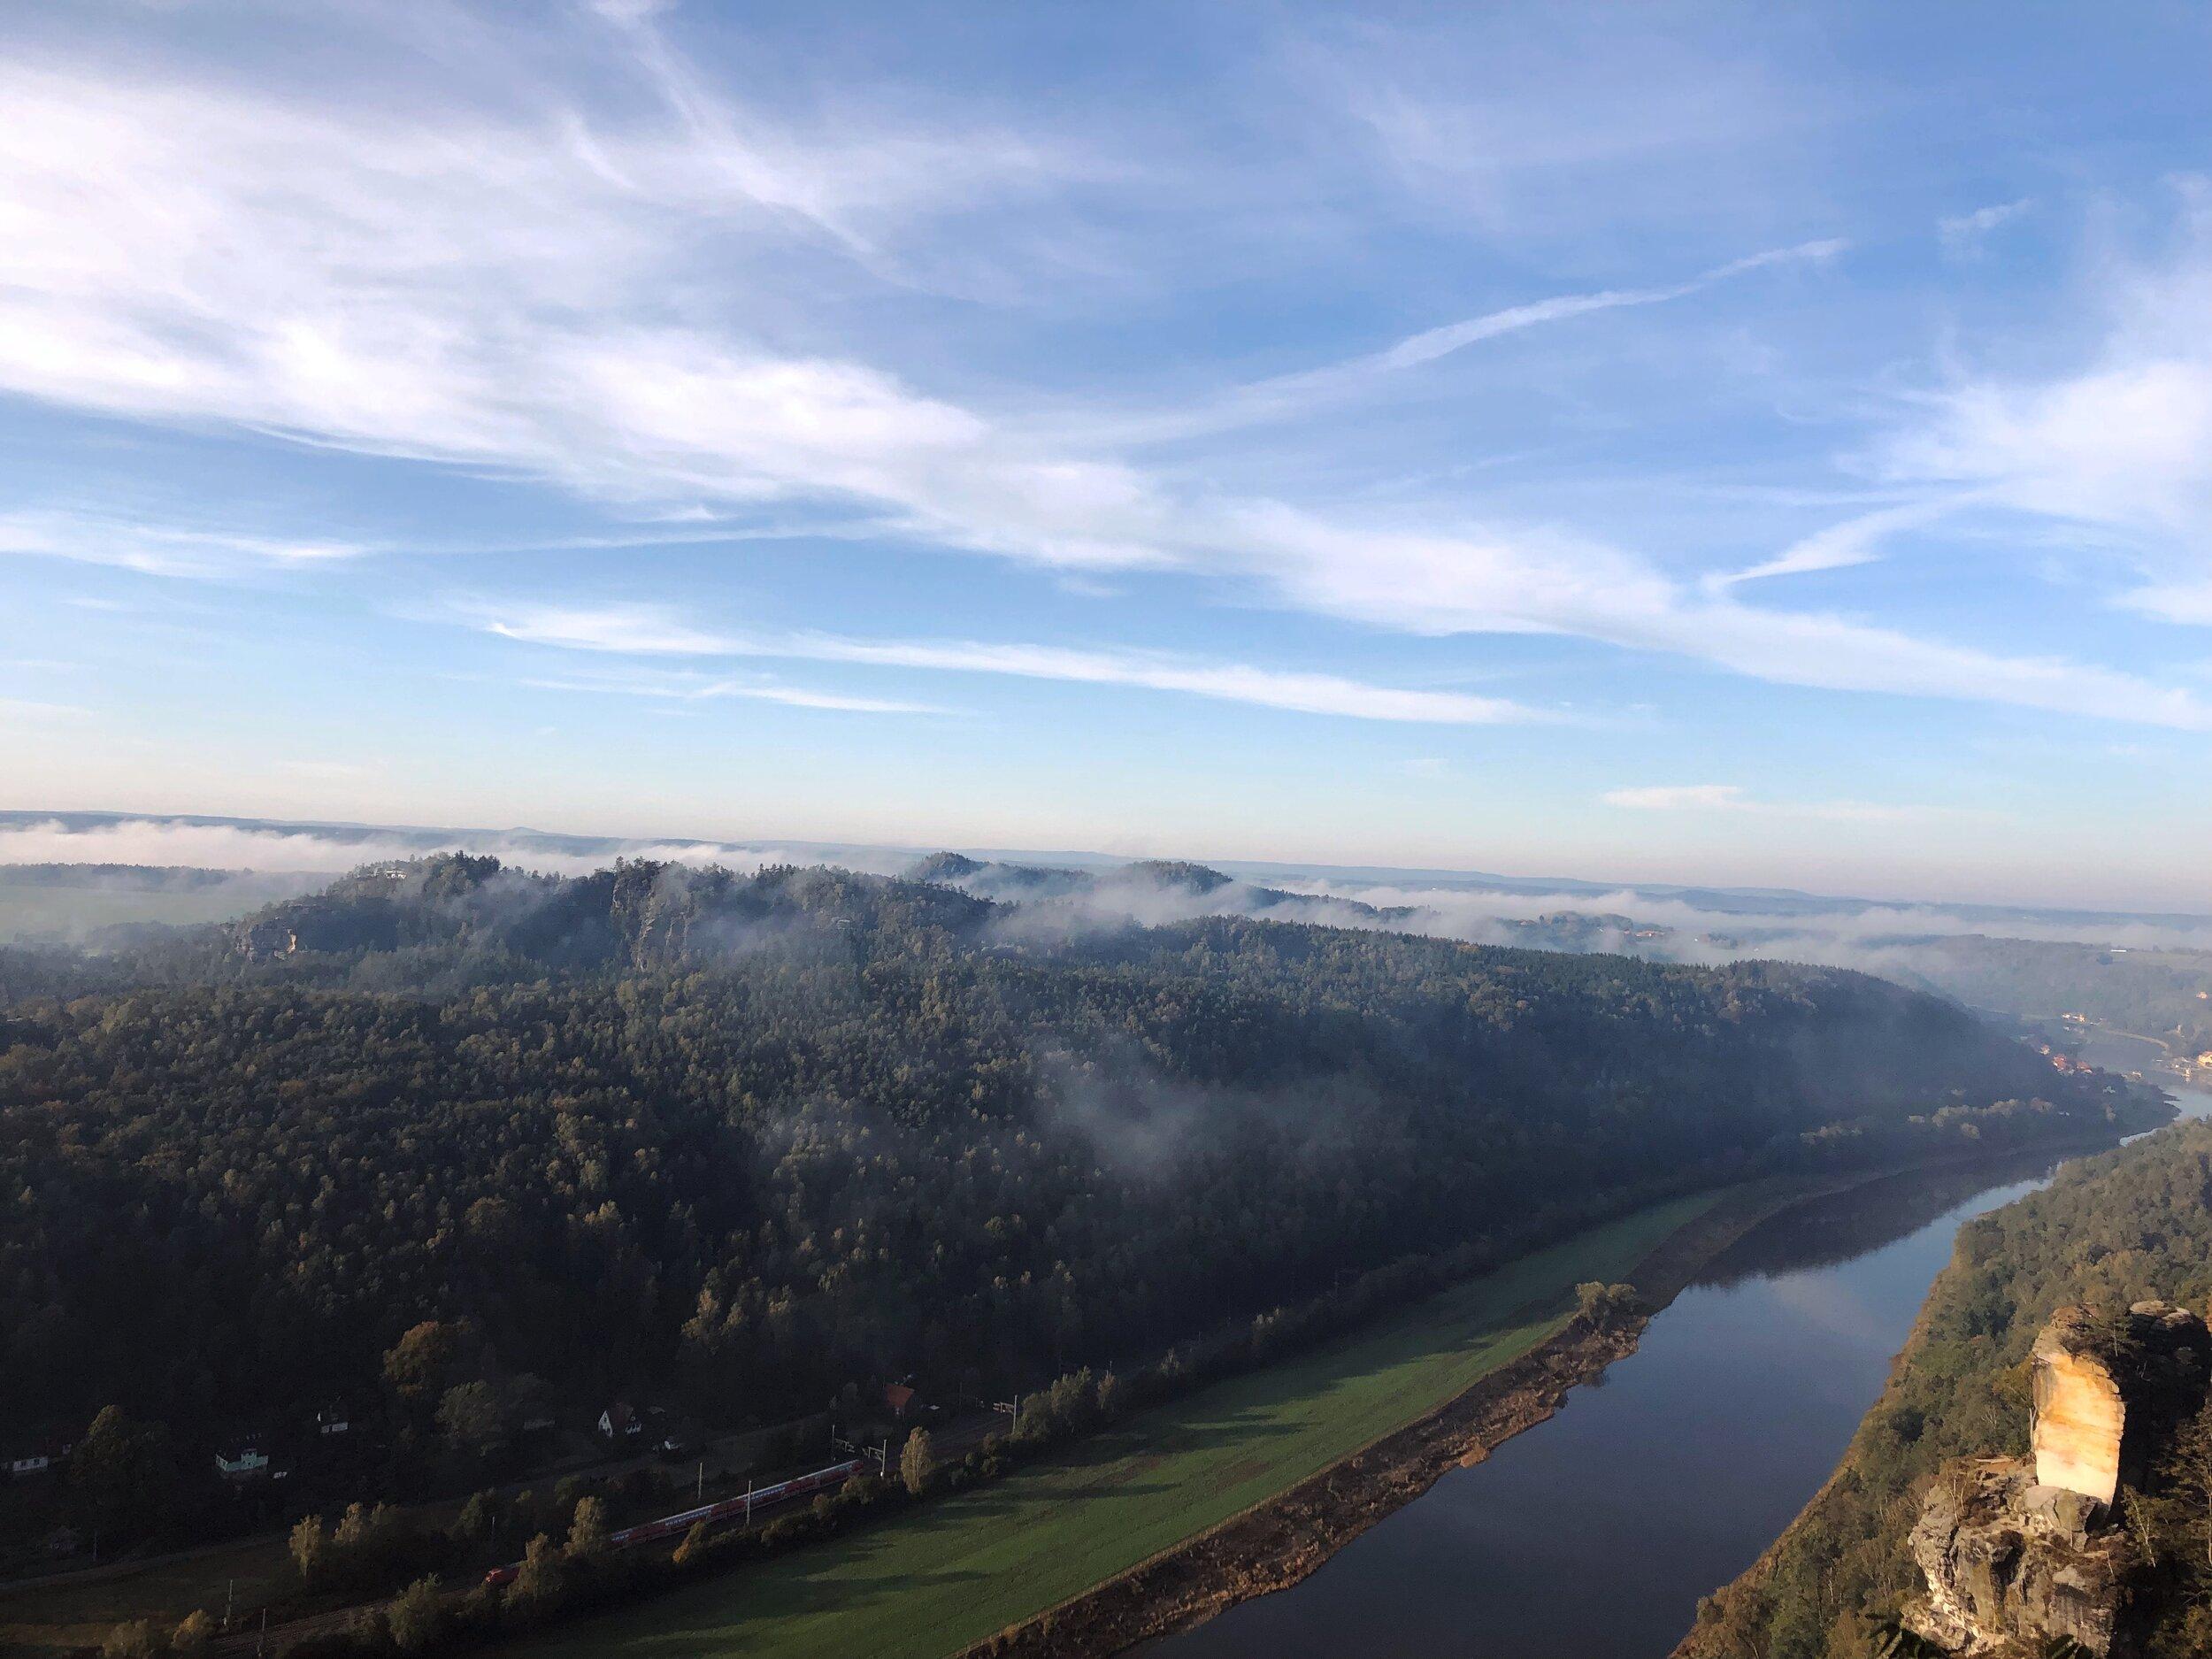 baste-bridge-lohmen-germany-hiking_0329.JPG